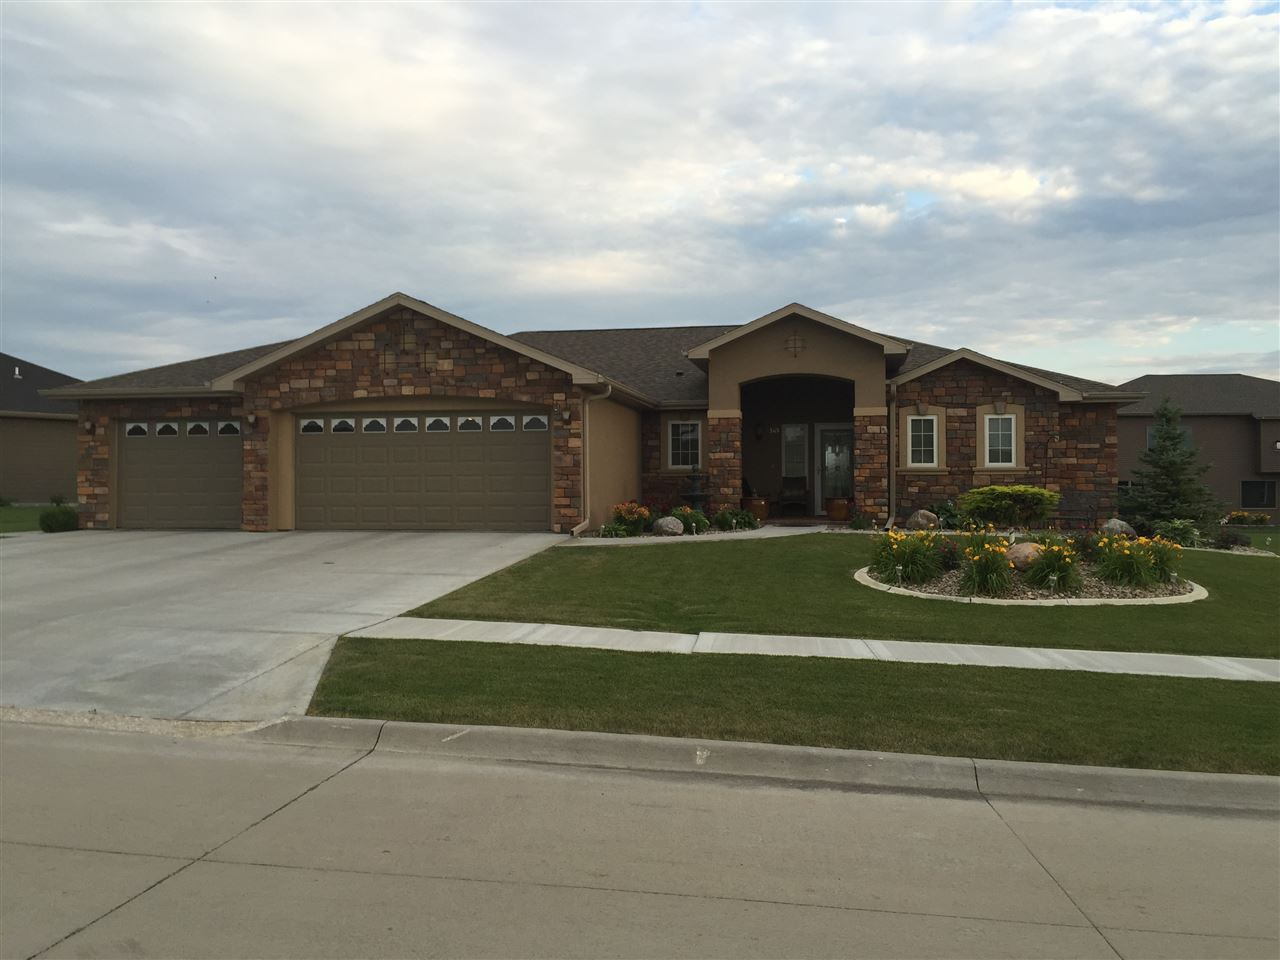 Real Estate for Sale, ListingId: 34156995, Hastings,NE68901